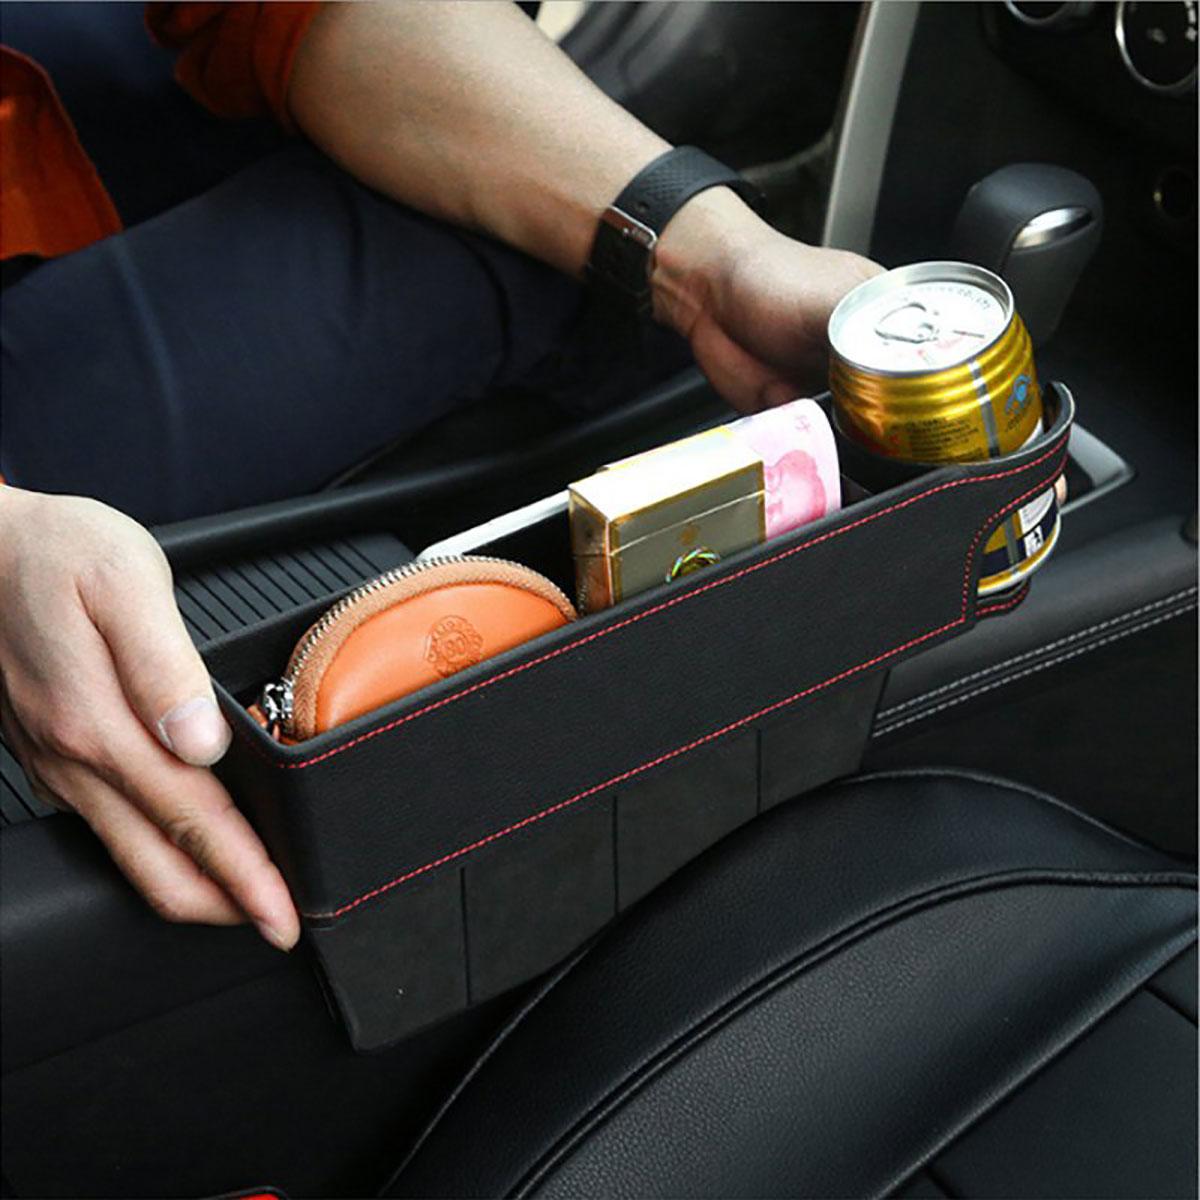 PU Leather Car Seat Crevice Cup Holder Storage Seat Gap Filler Multifunctional Pocket Organizer